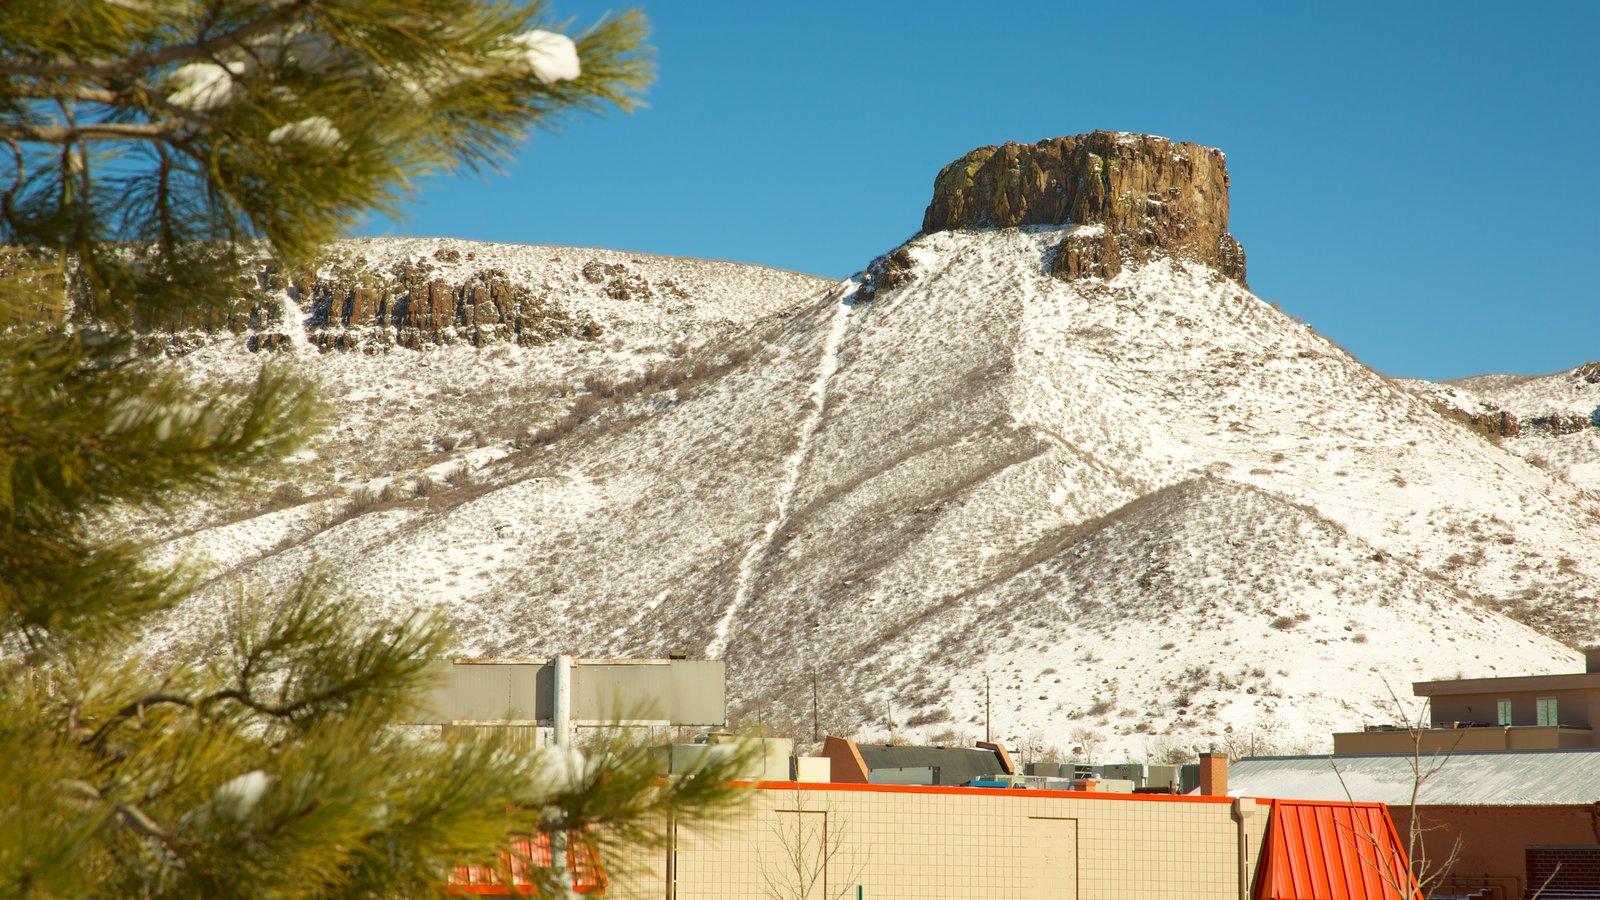 Golden caracterizando neve e montanhas